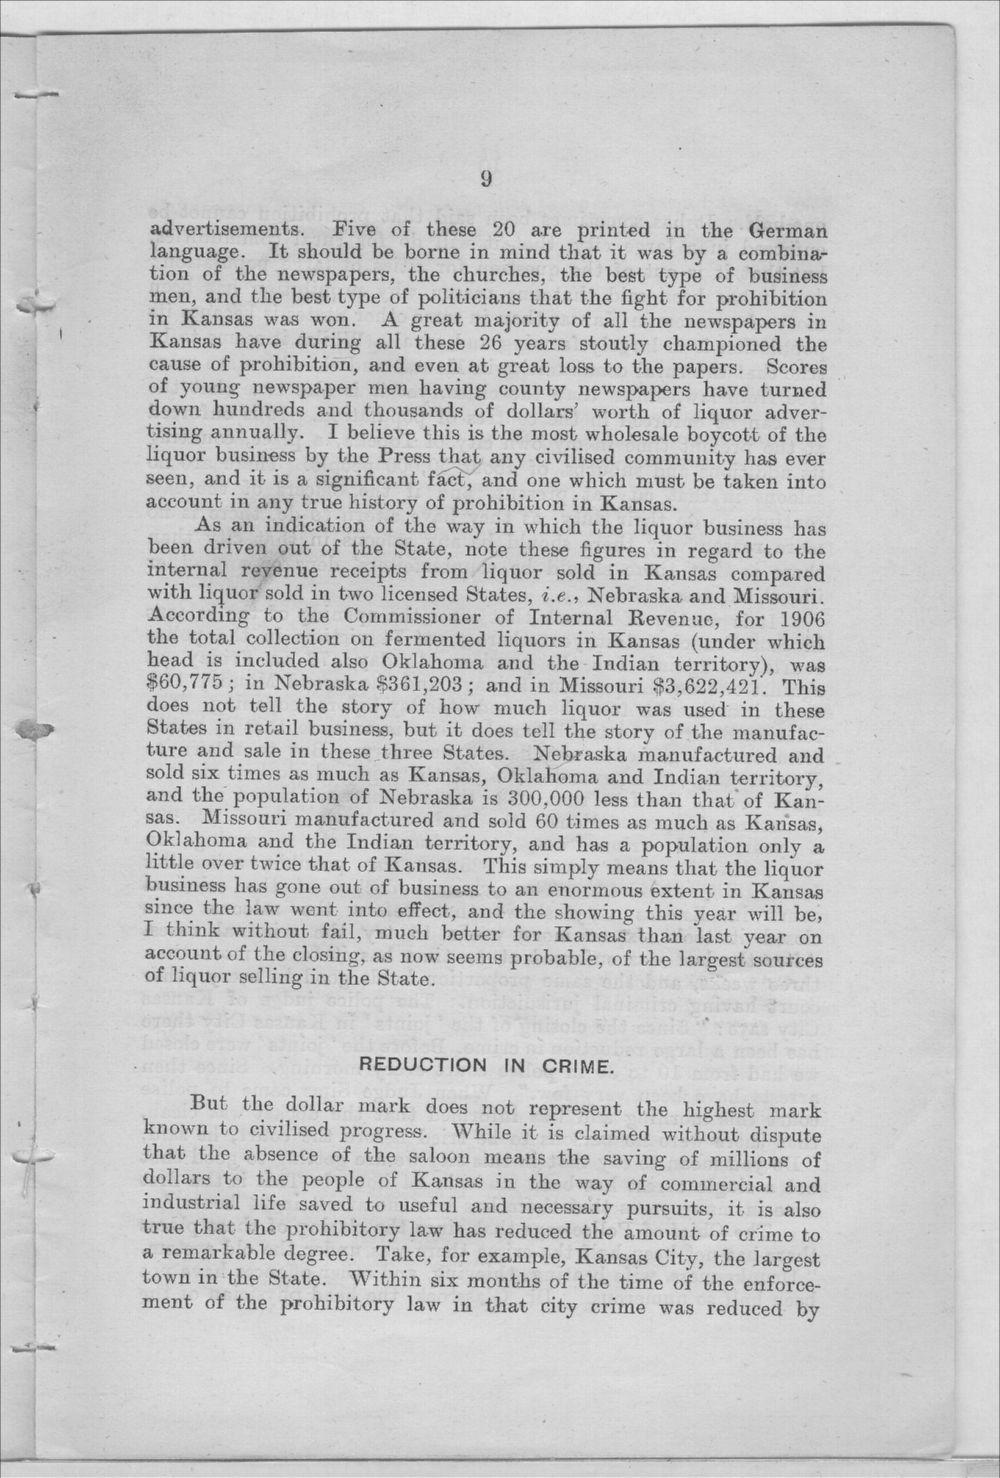 Prohibition in Kansas, U.S.A. - 9